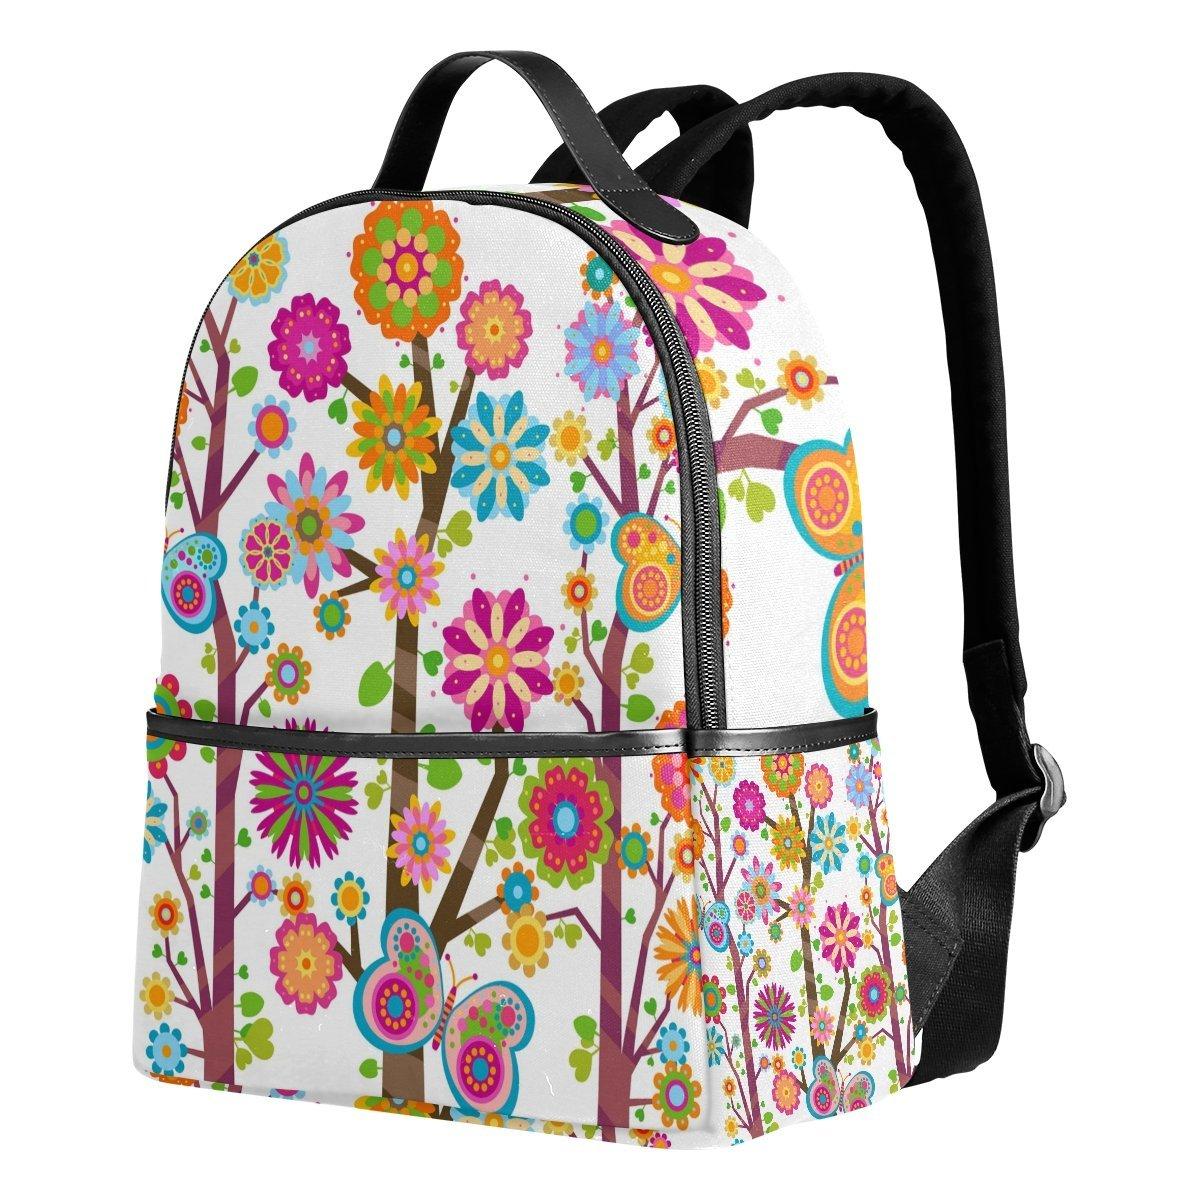 Skull Cat Moon Gothic Pattern Black Travel Duffel Bag Waterproof Fashion Lightweight Large Capacity Portable Luggage Bag